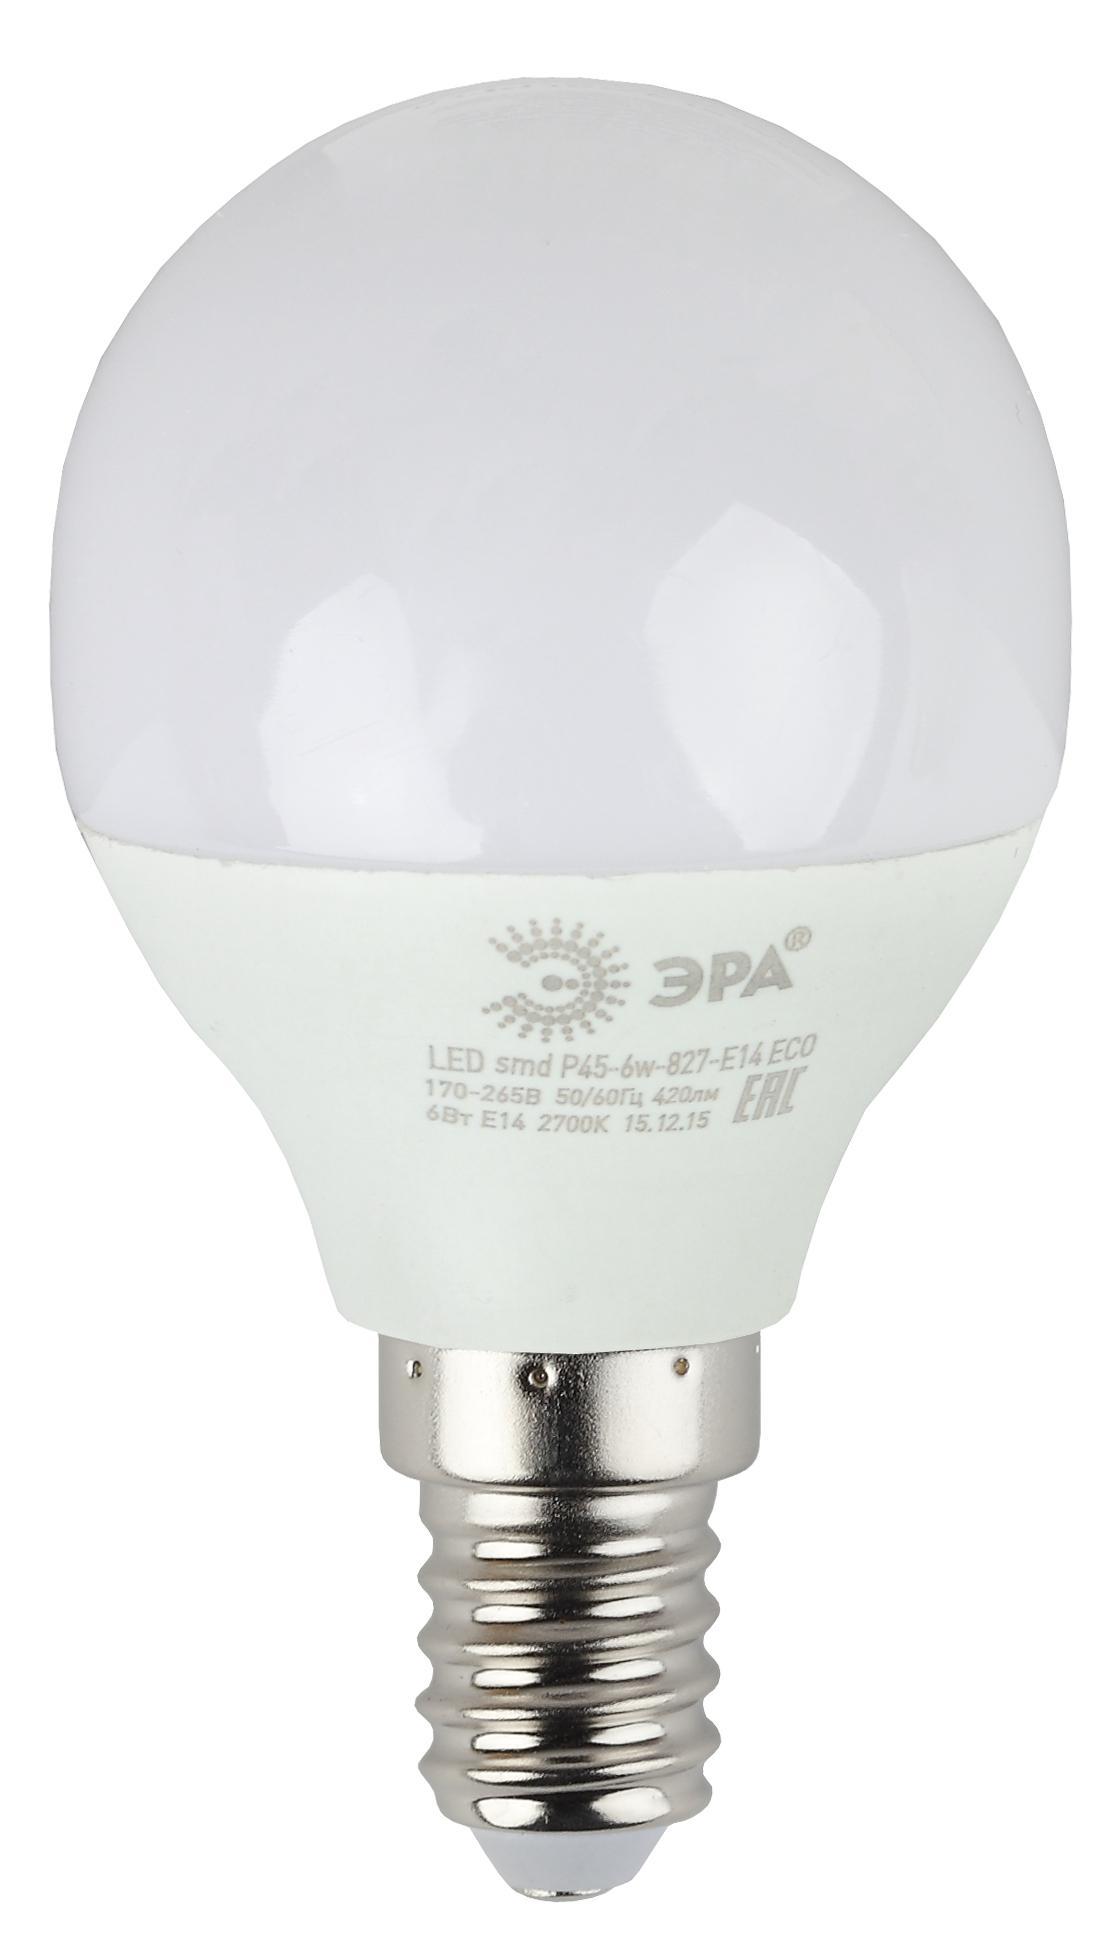 Лампа светодиодная ЭРА Led smd Р45-6w-827-e14_eco